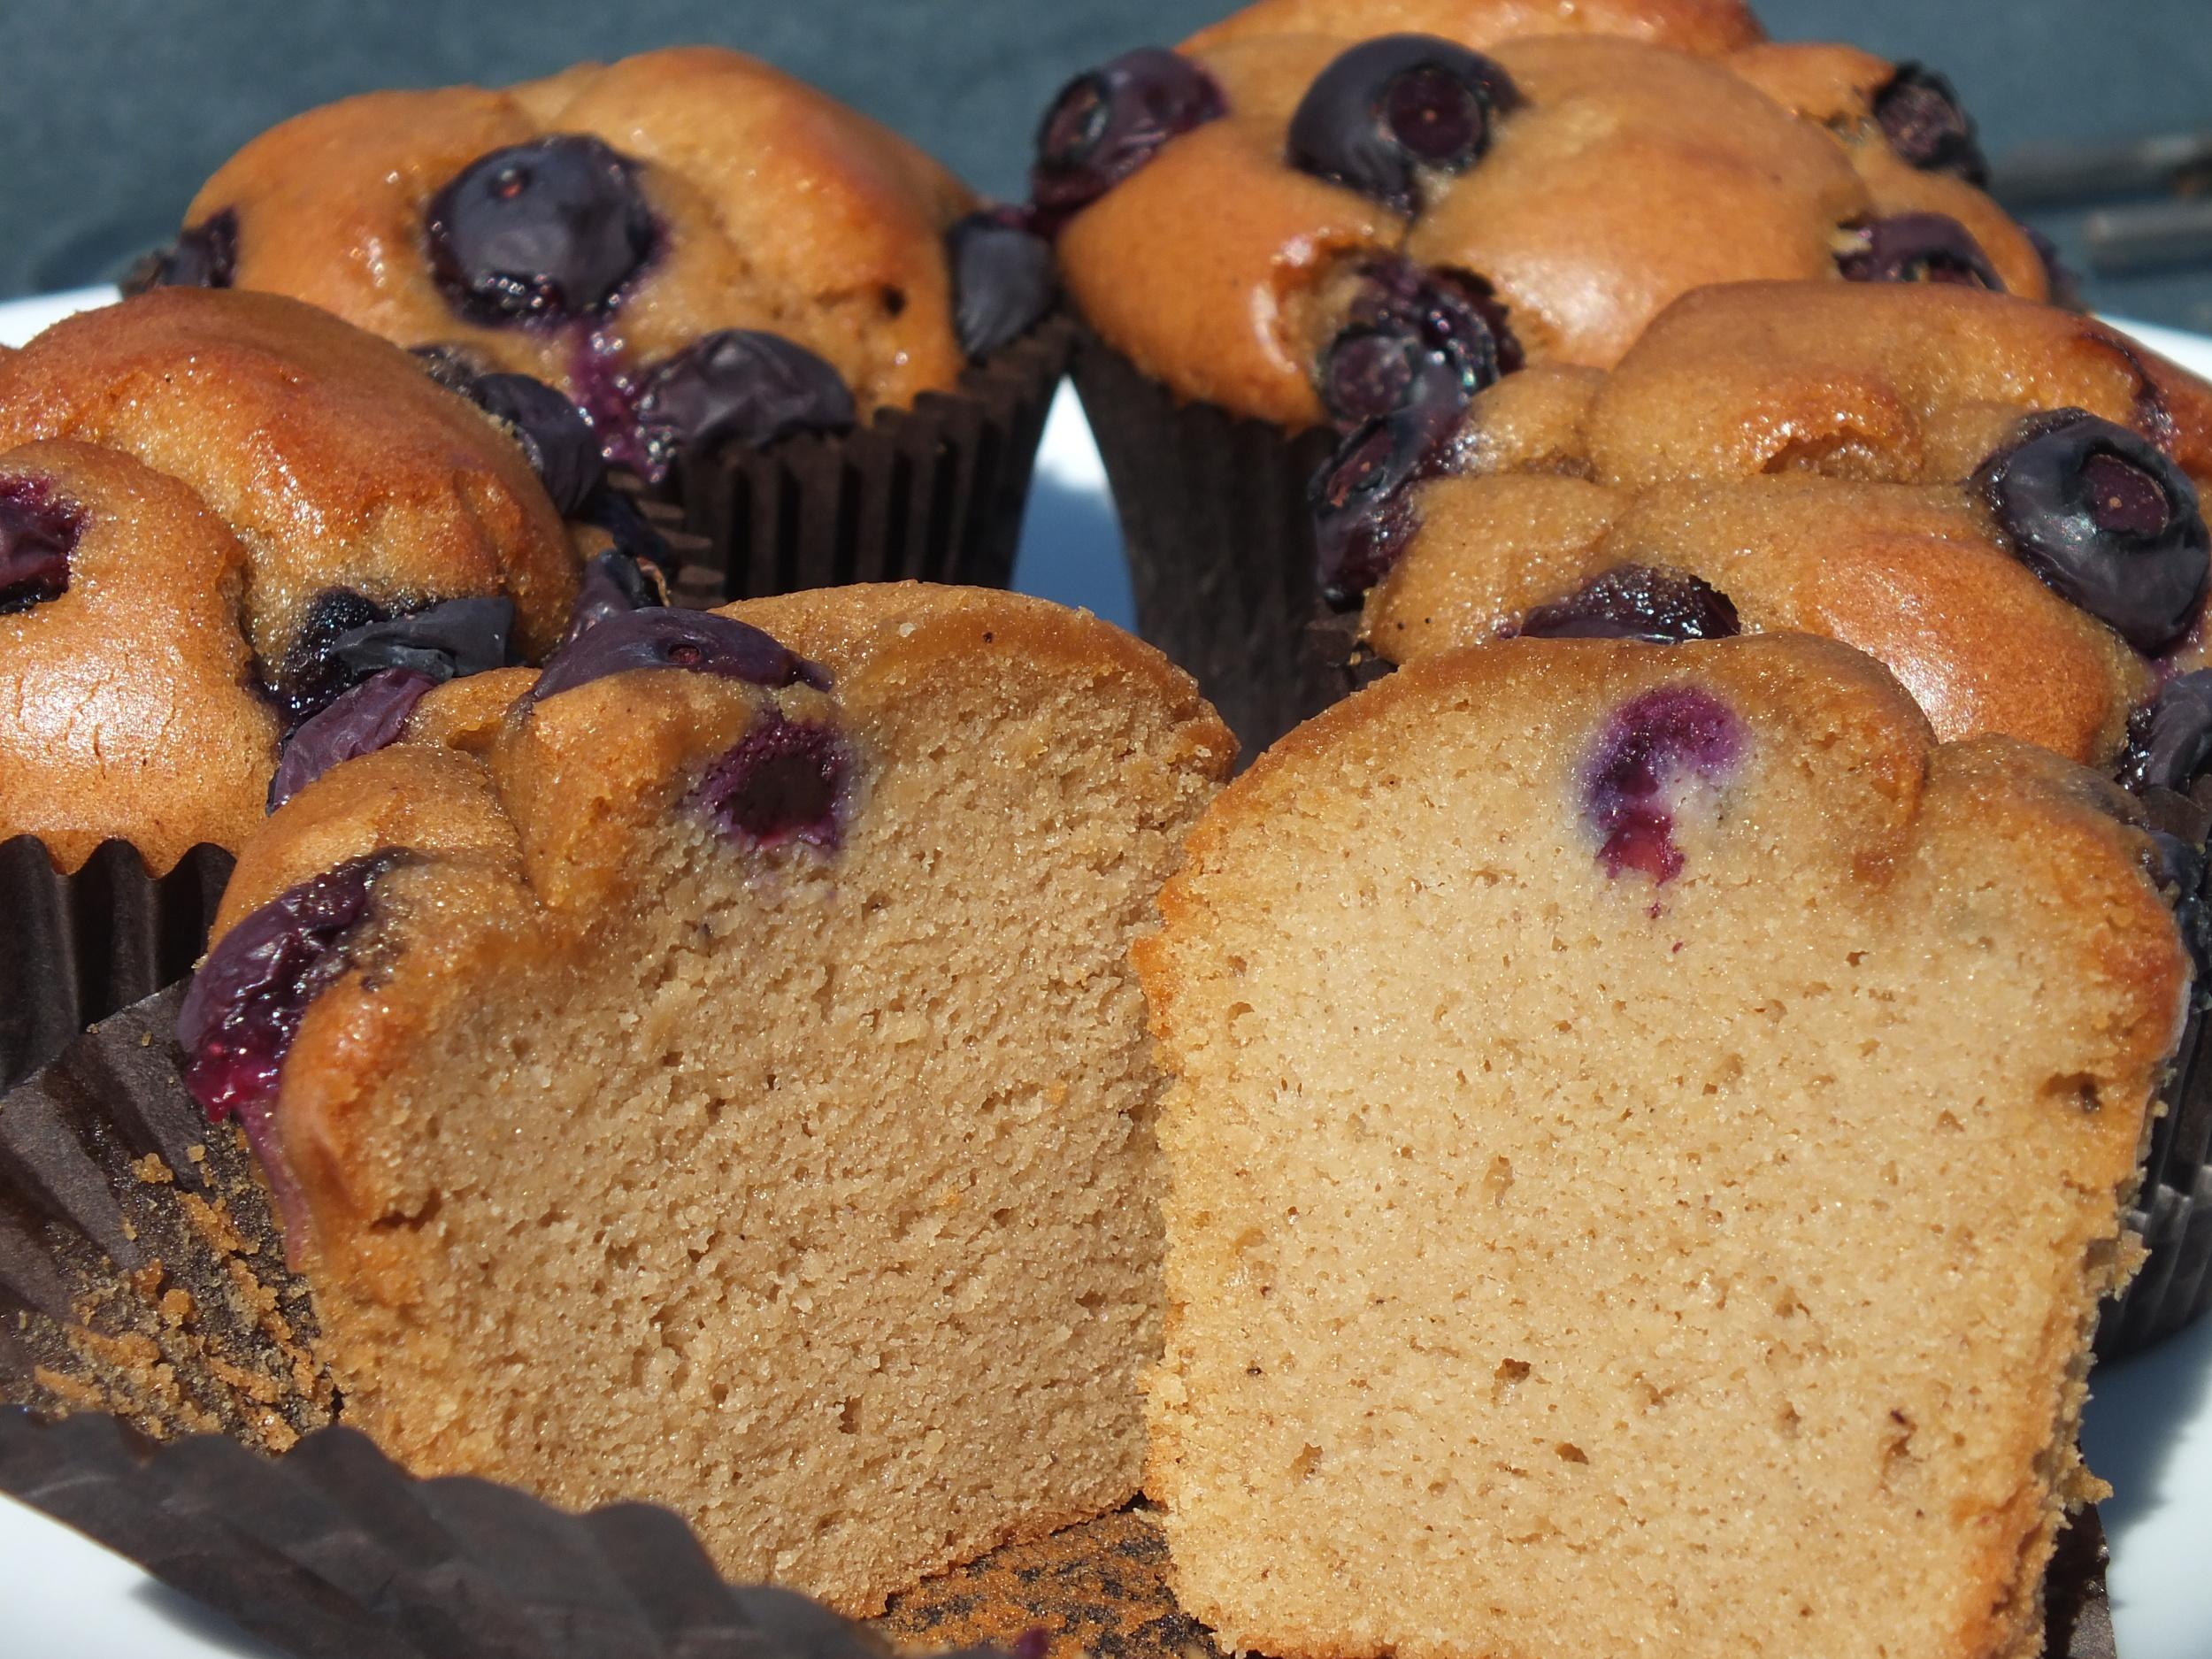 Sliced Muffin